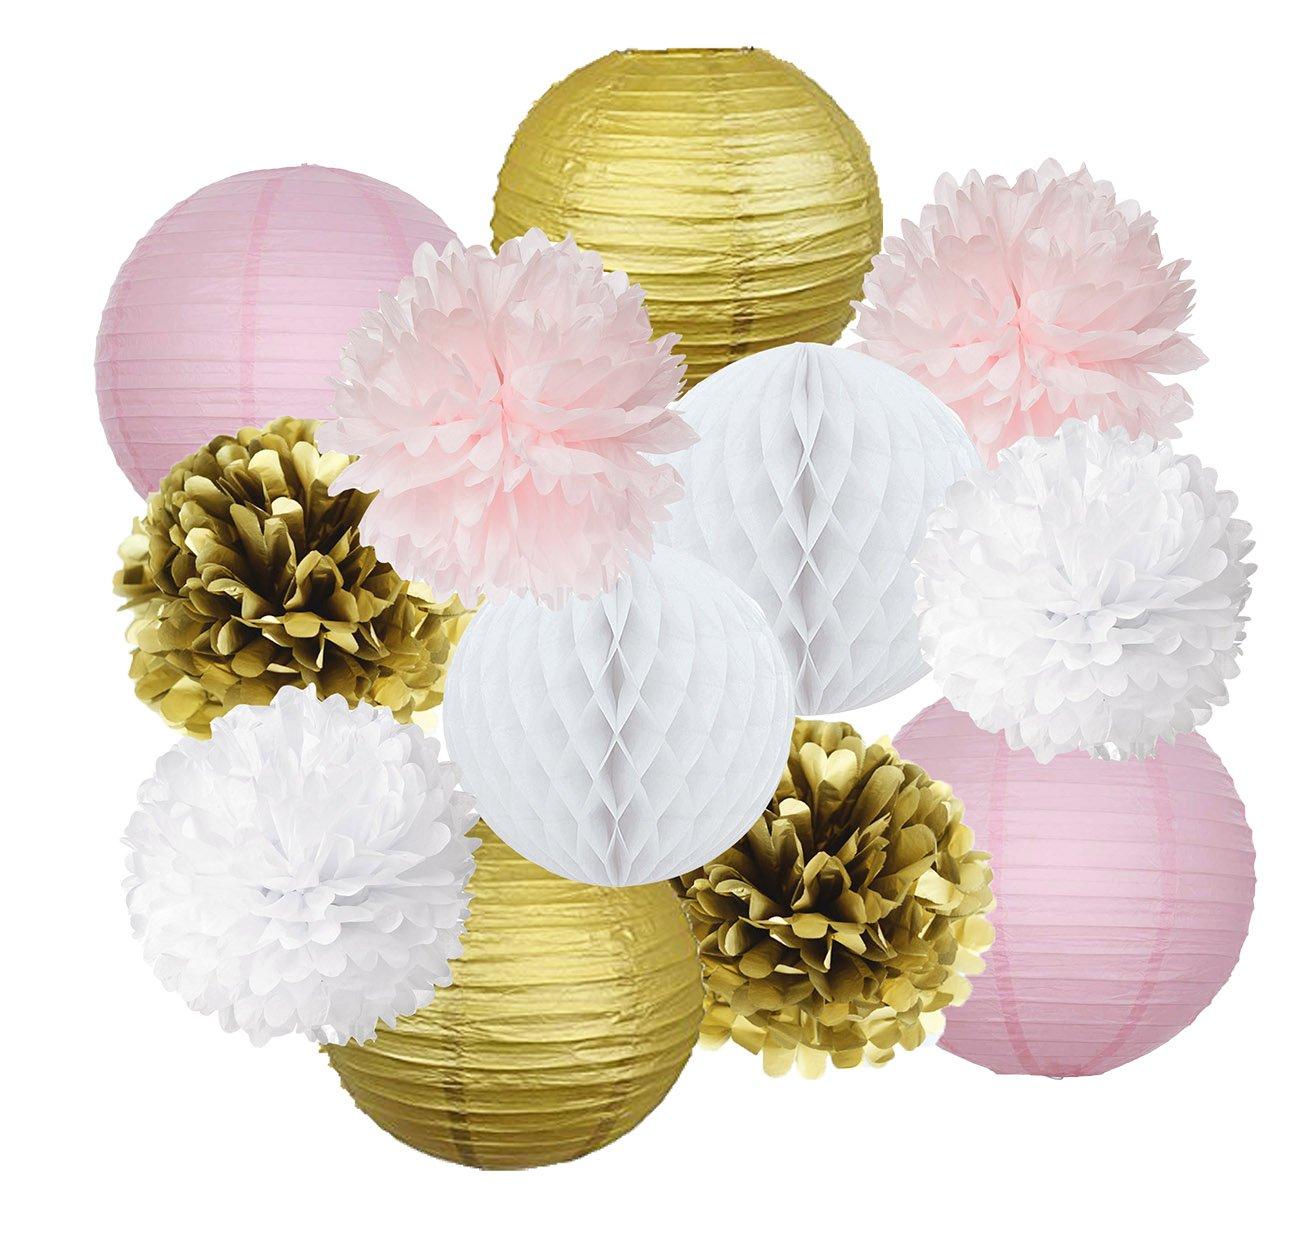 Baby shower wedding buy tissue paper poms tissue paper pom pom kit - Amazon Com Pink Baby Shower Decorations Furuix 12pcs Pink Gold Party Decoration Kit Tissue Paper Pom Pom Honeycomb Ball And Paper Lantern For Girls